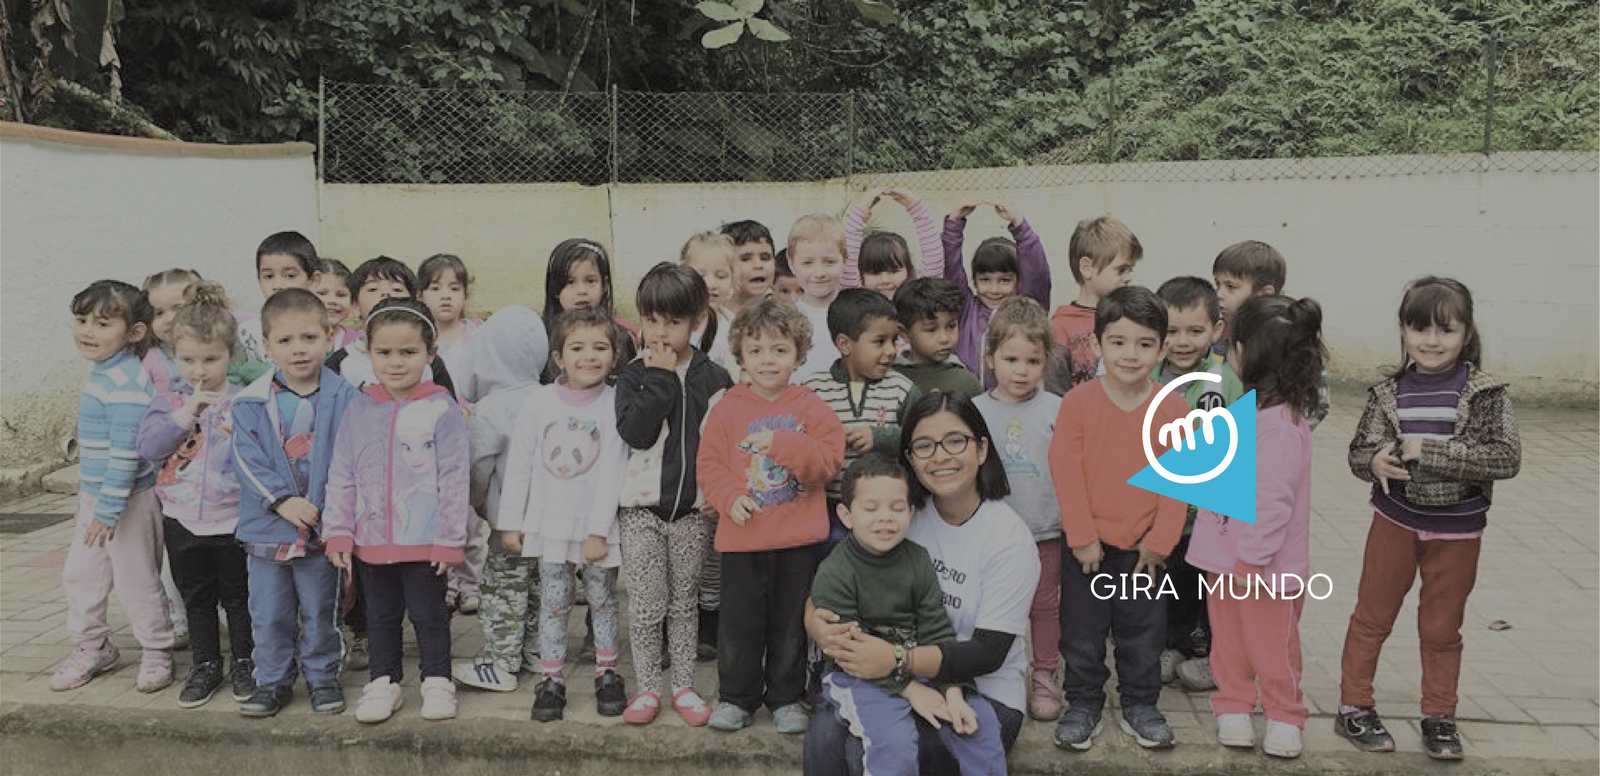 Gira Mundo - Quality Education in Blumenau